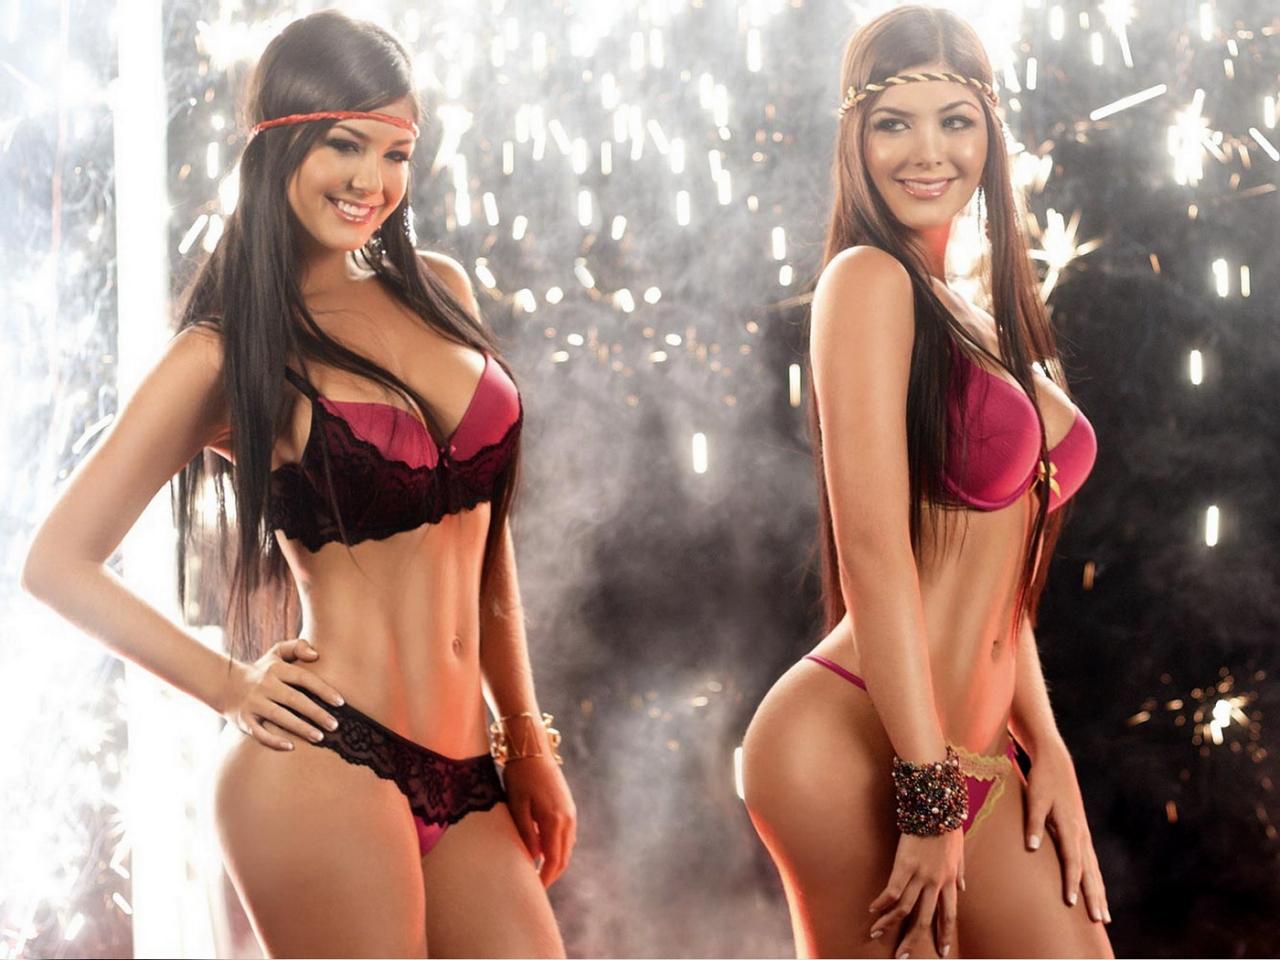 twins_01_01.jpg